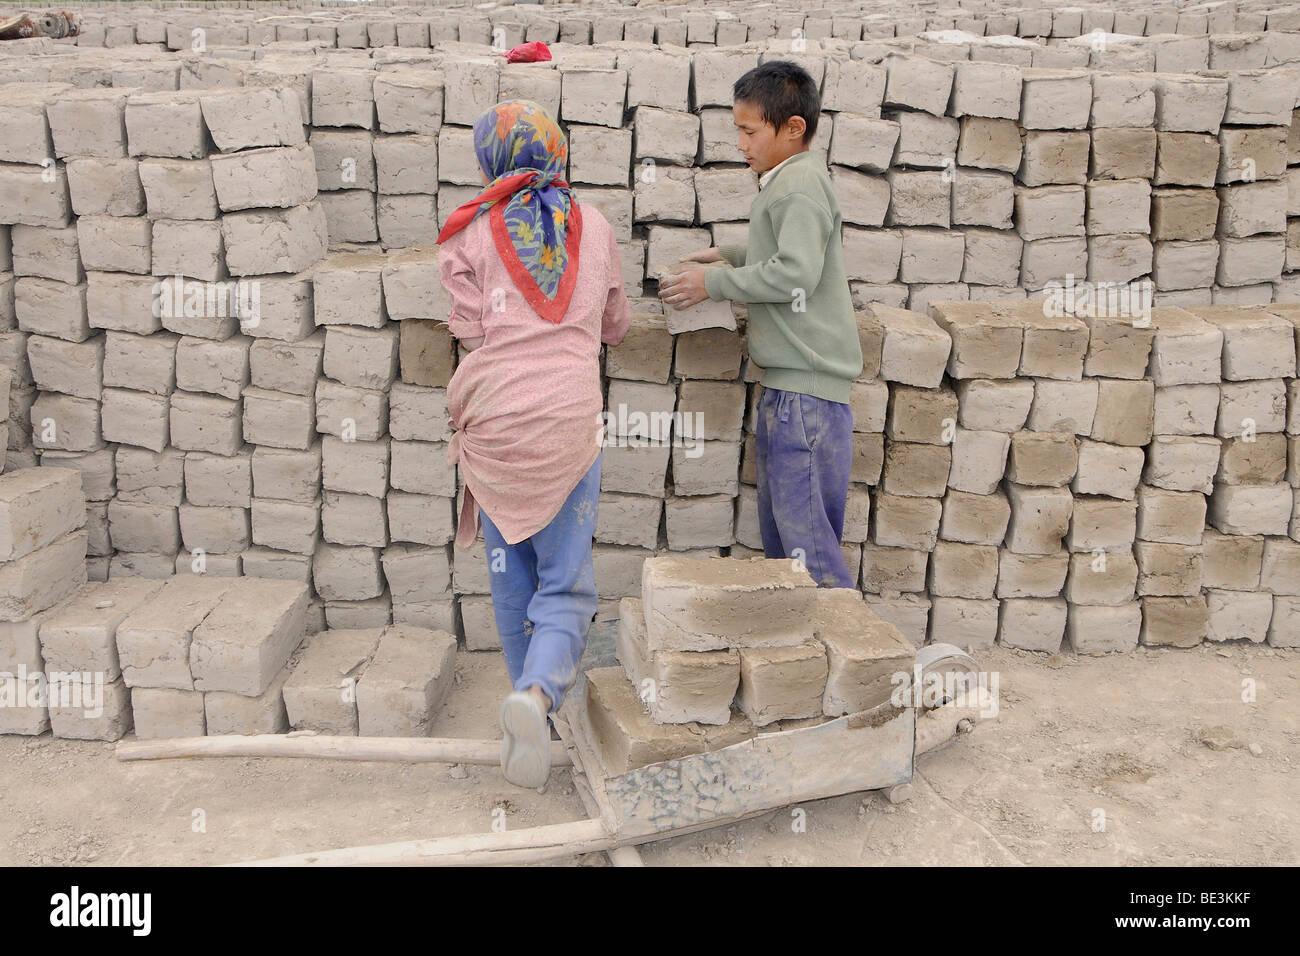 Brickmakers with child labor near Shey, Ladakh, India, Himalayas, Asia - Stock Image